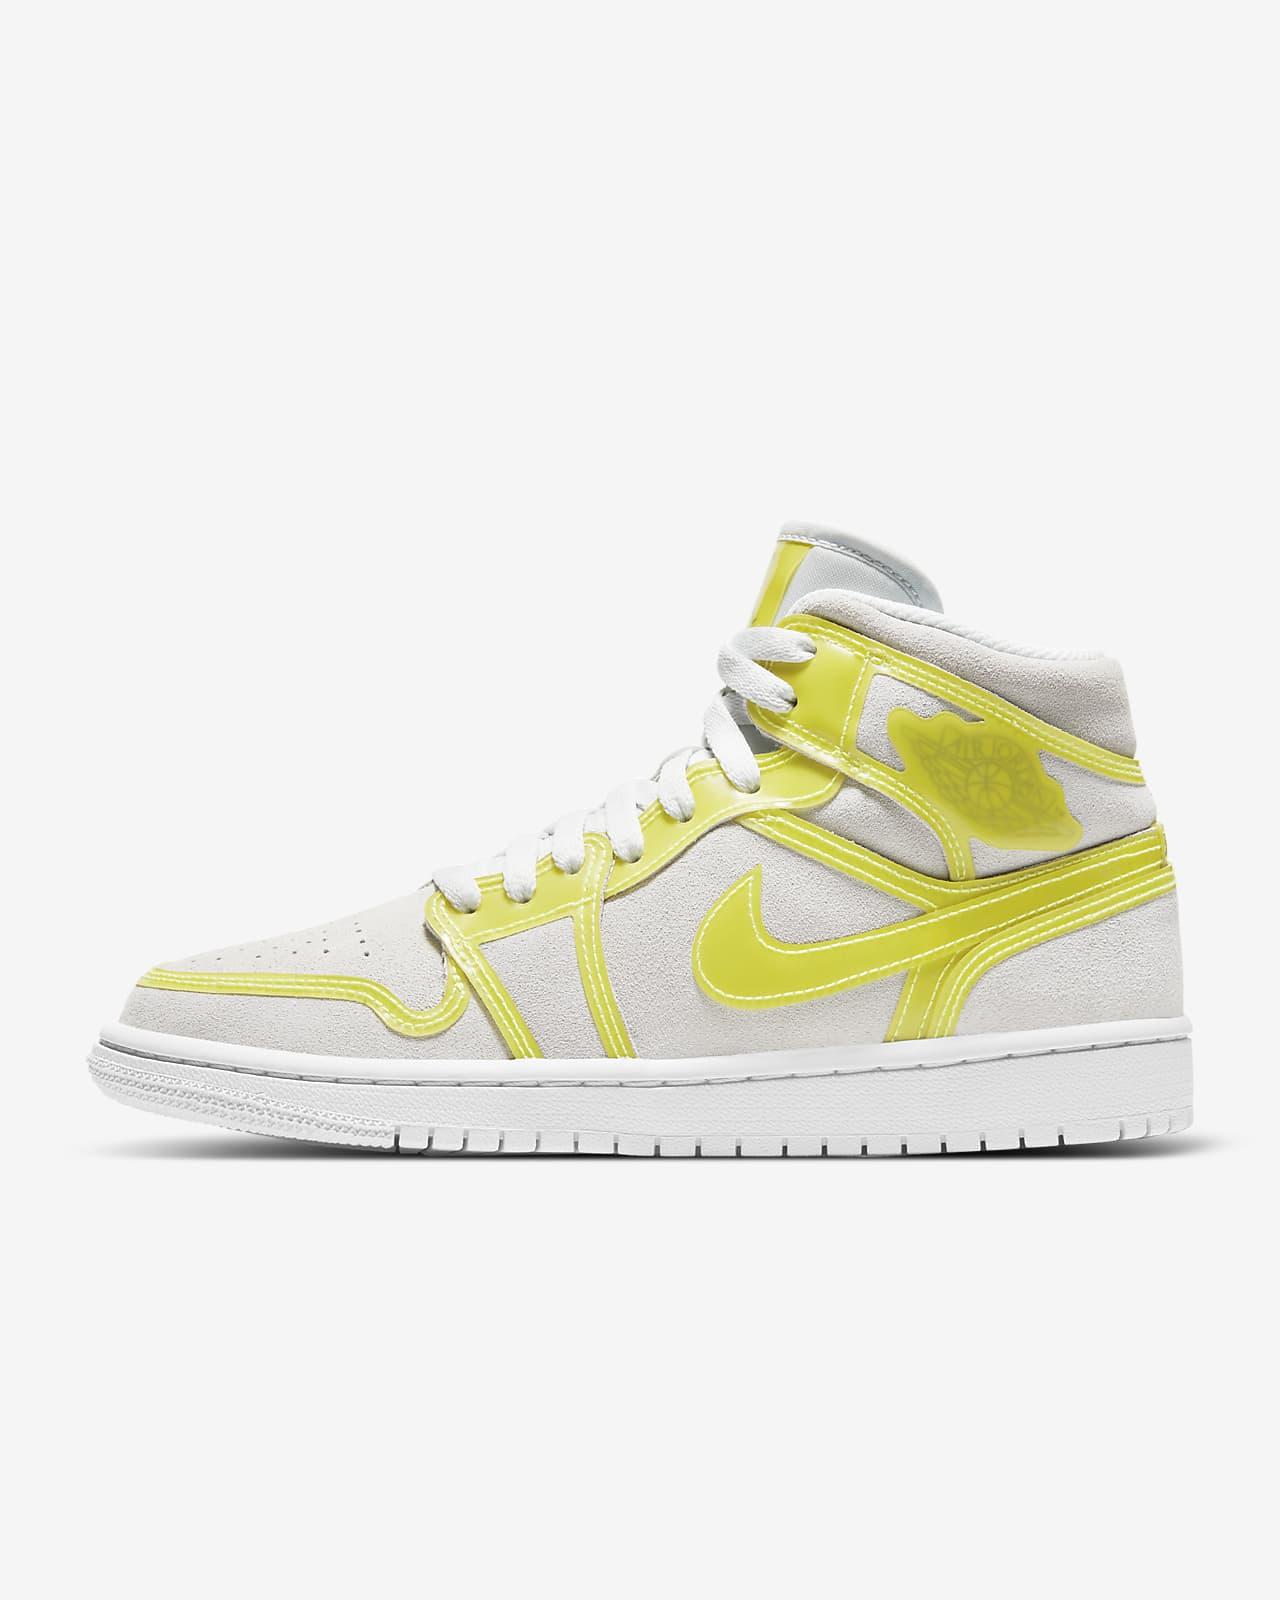 Air Jordan 1 Mid LX Women's Shoe